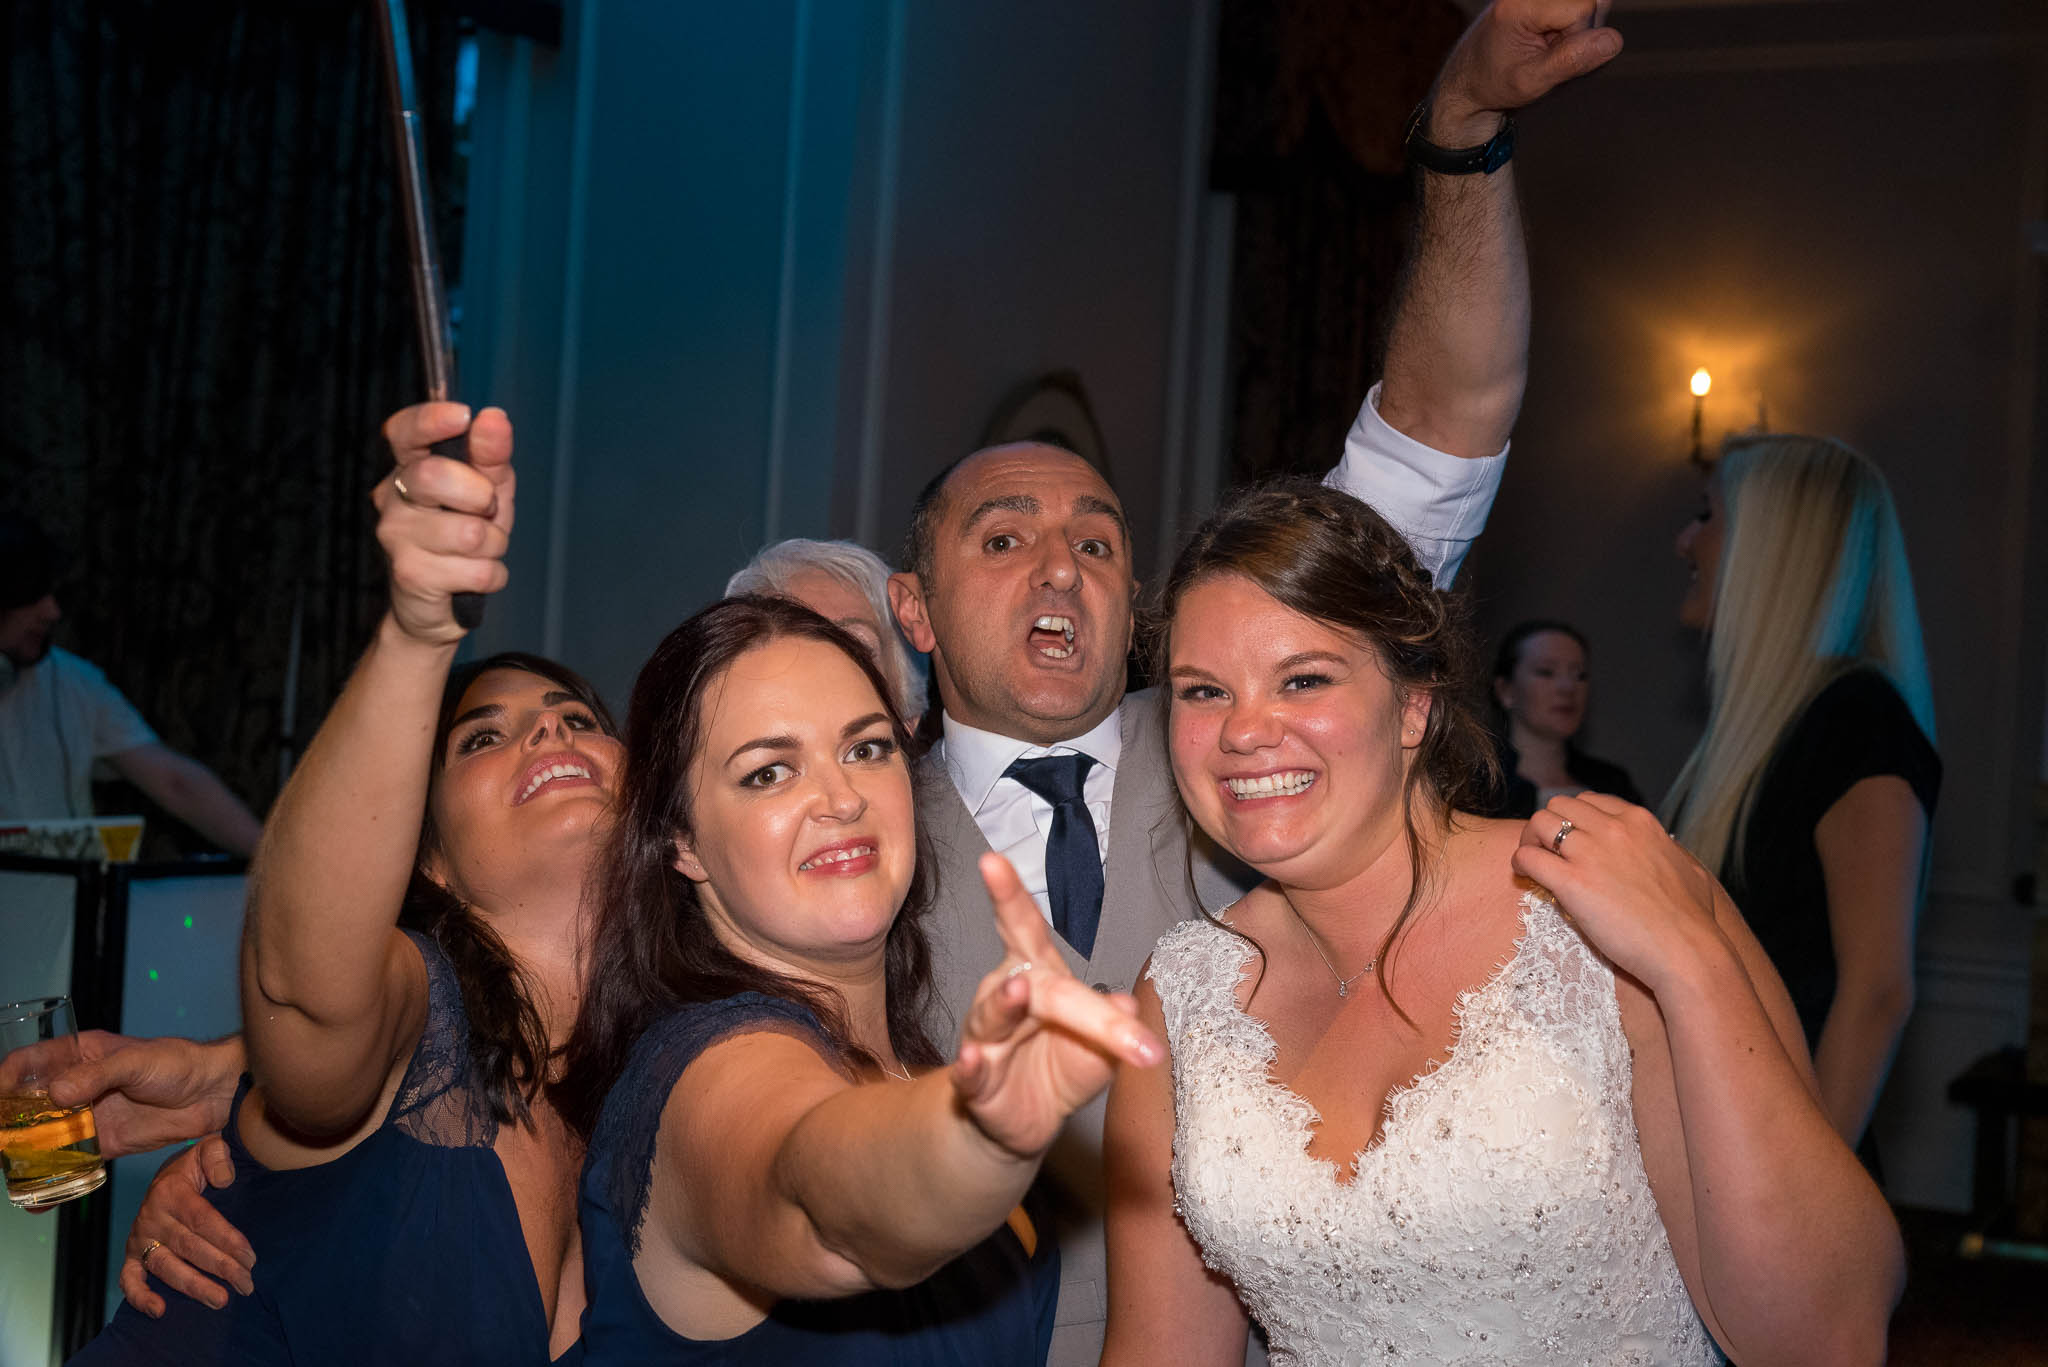 Crathorne Hall Hotel Wedding Photographer95.jpg